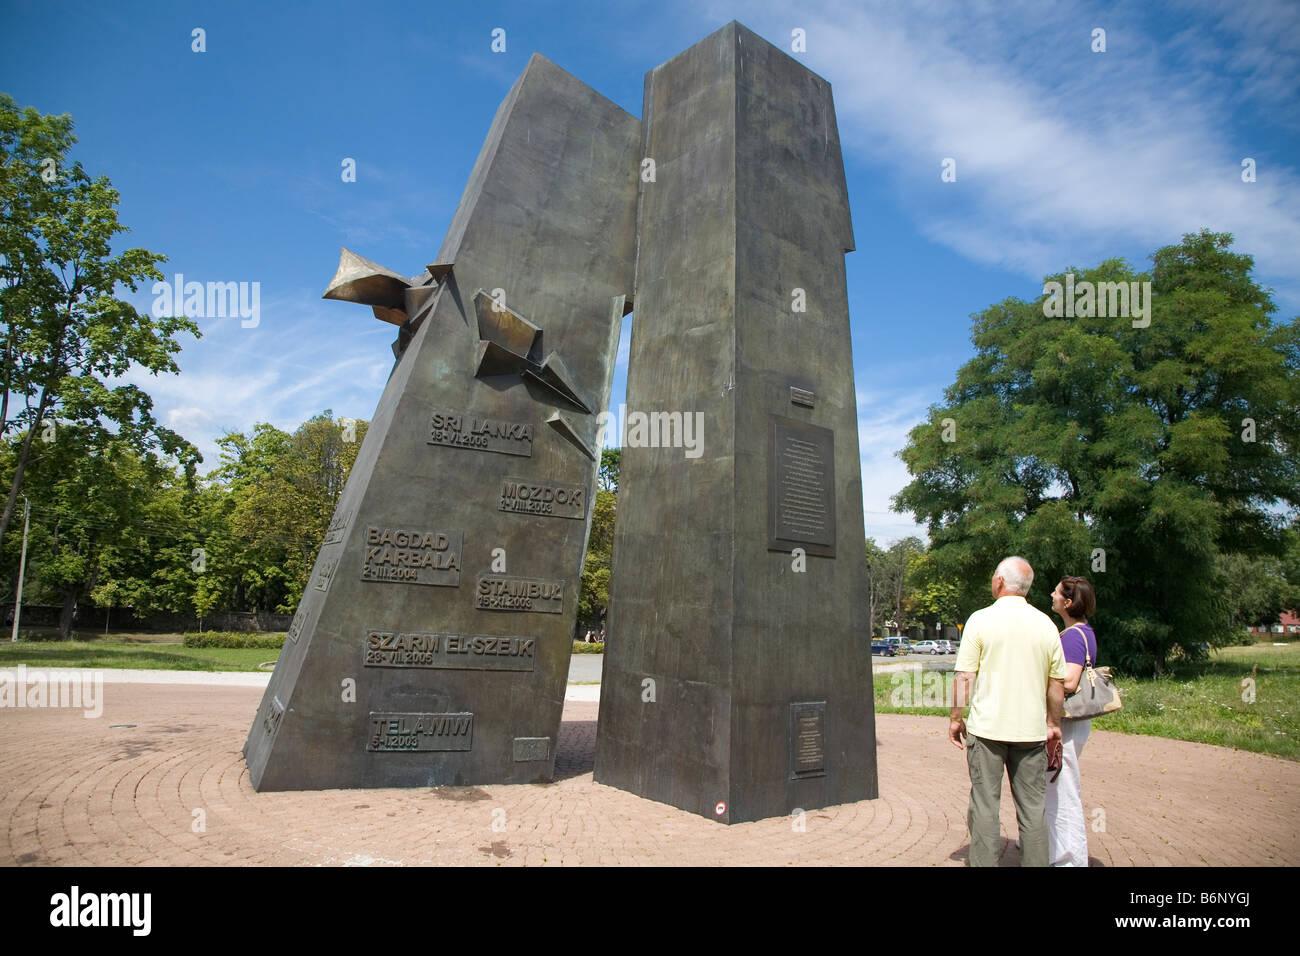 9/11 Memorial  Kielce Poland - Stock Image